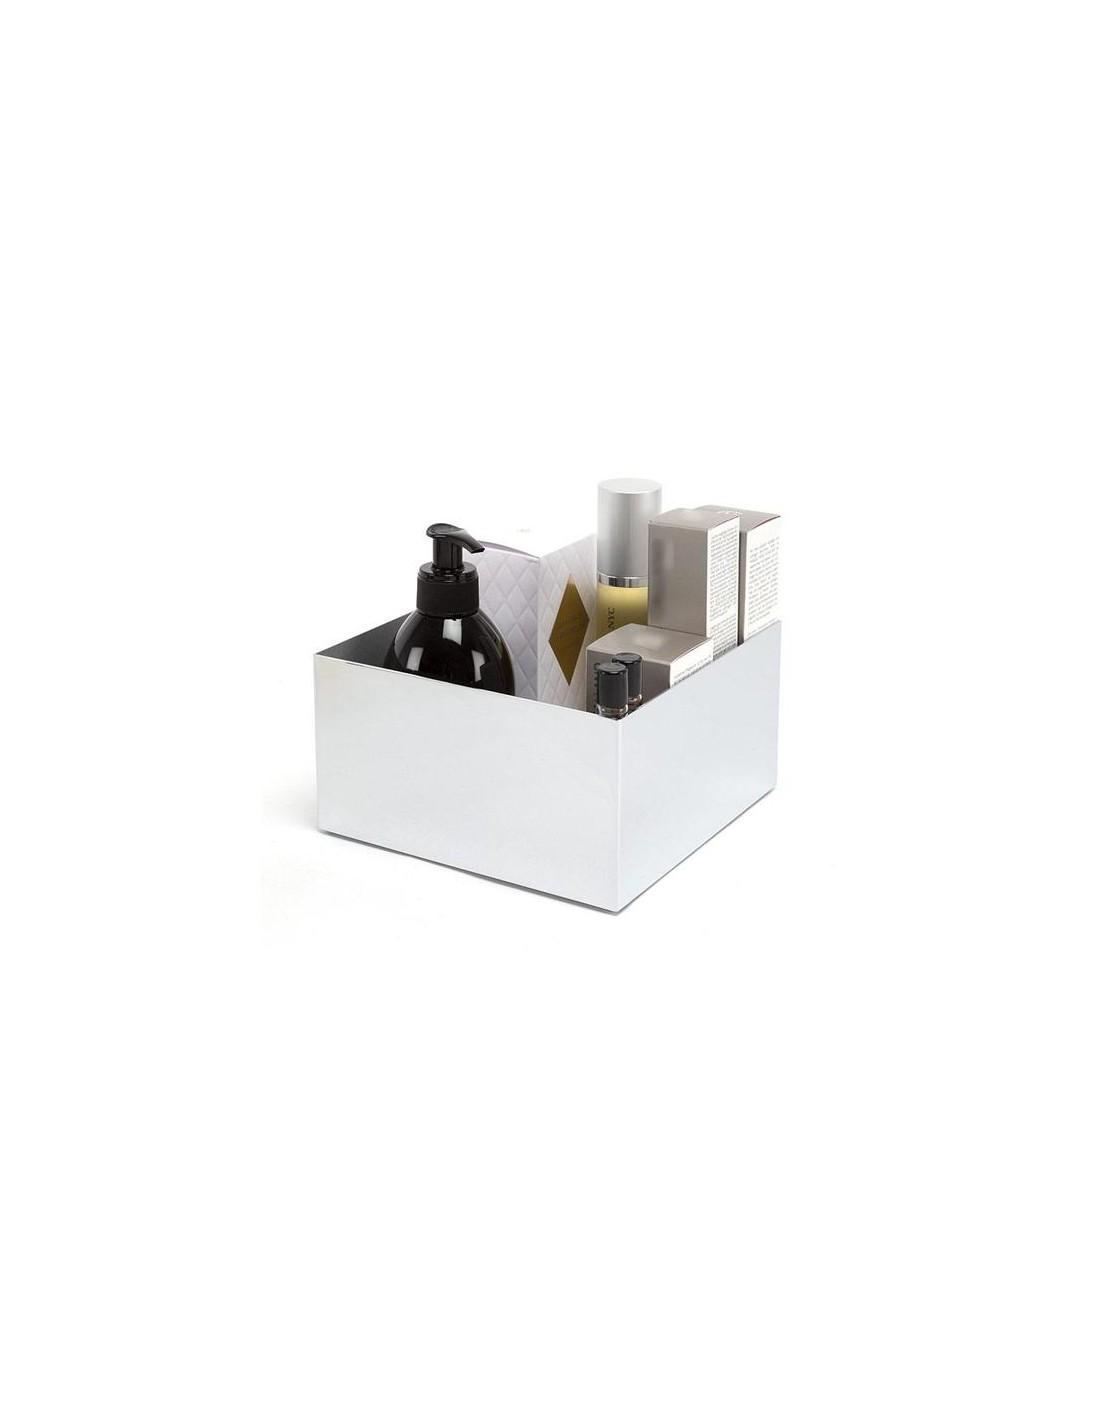 Boite de rangement carr e for Boite decorative de rangement